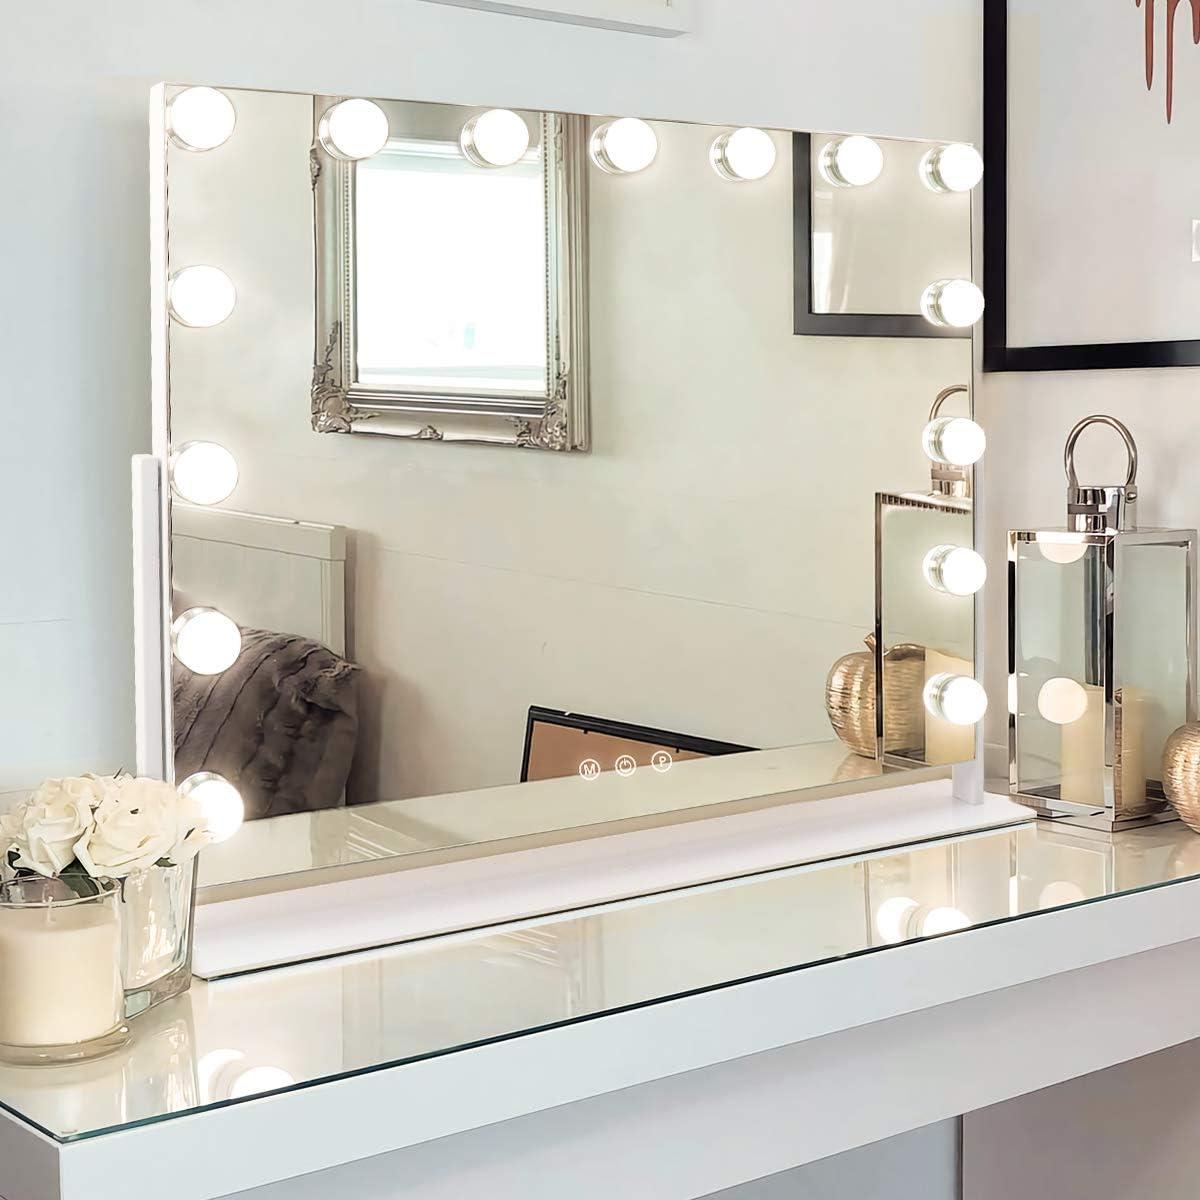 MISAVANITY Large Store Vanity Makeup Mirror Max 66% OFF Lights with Hollywood Make